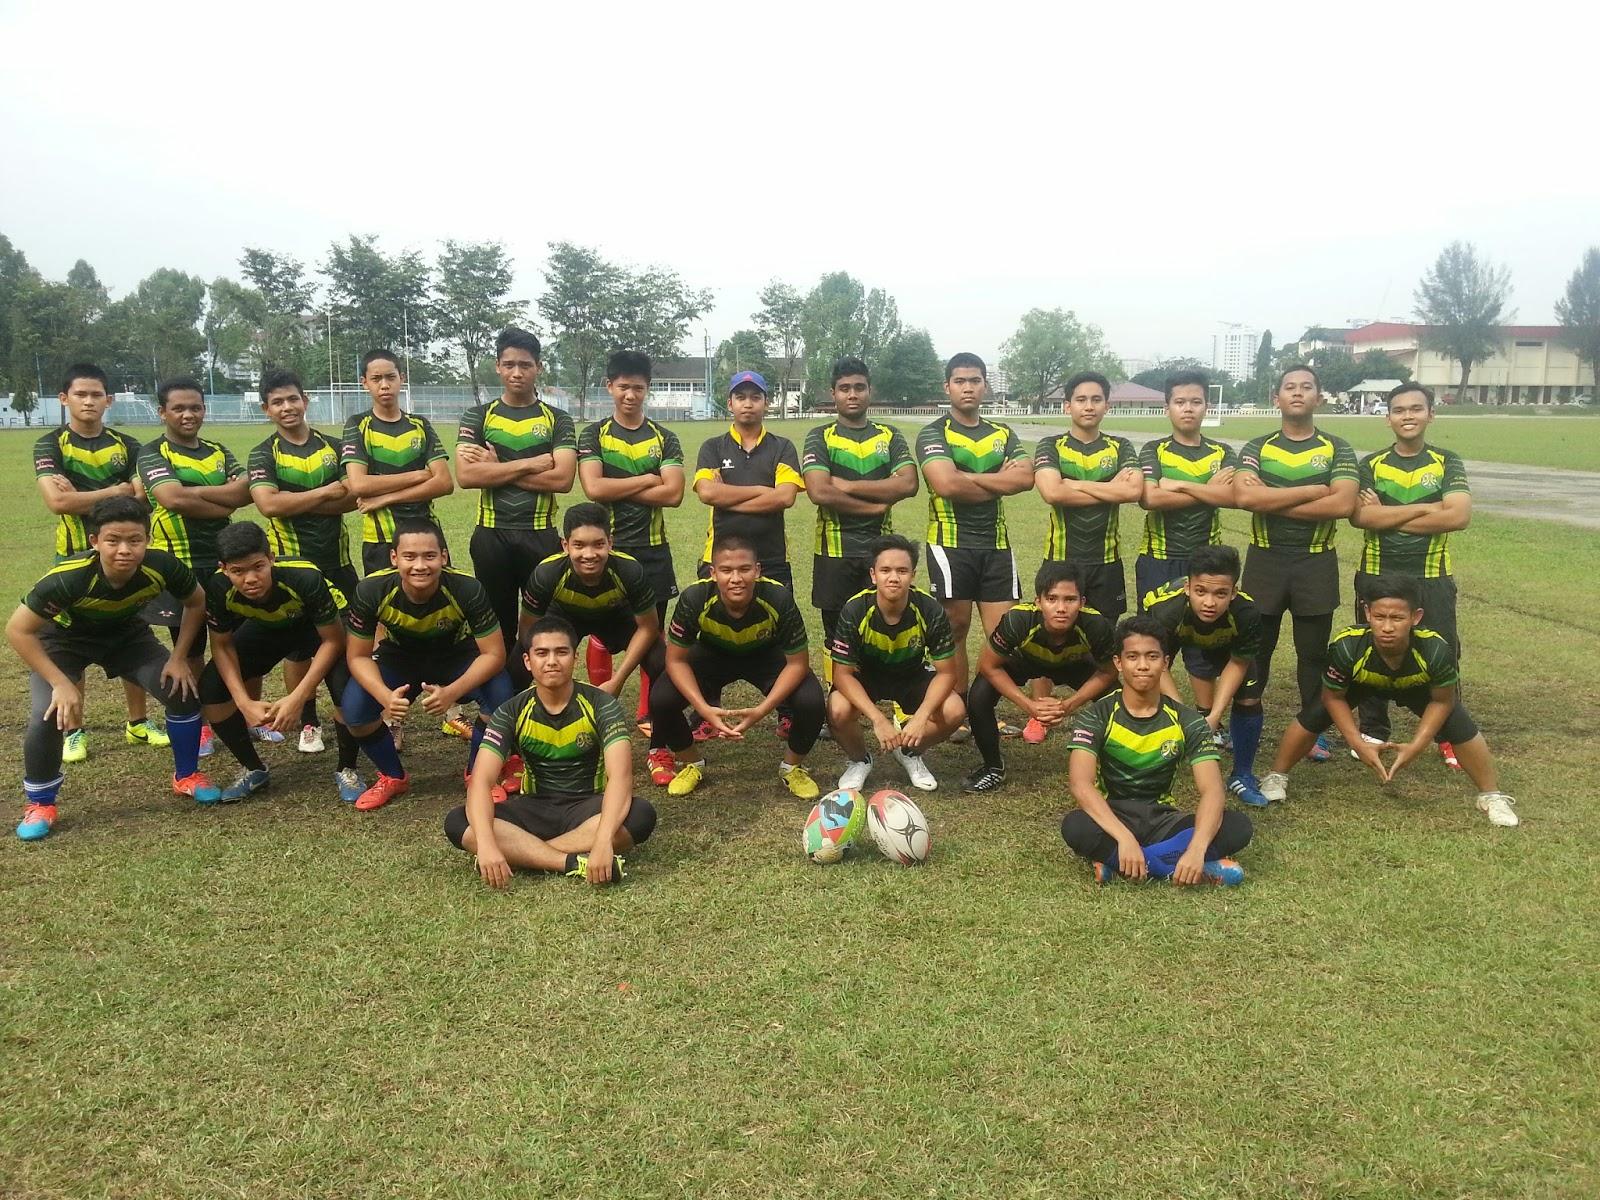 team ragbi 2015